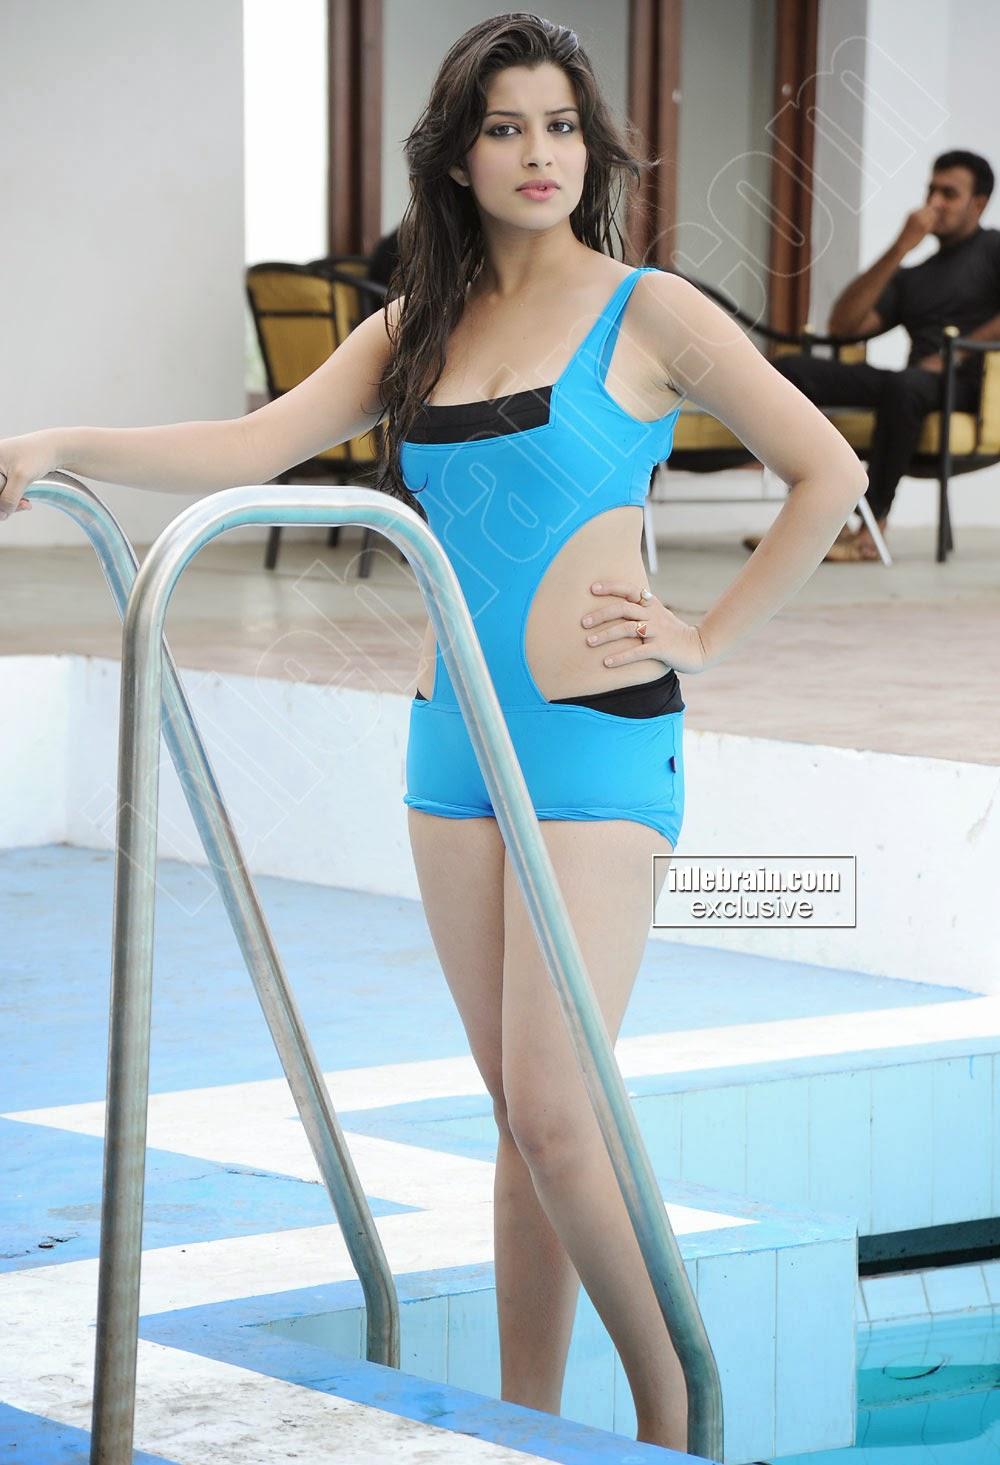 bollywood actress bikini photos gallery